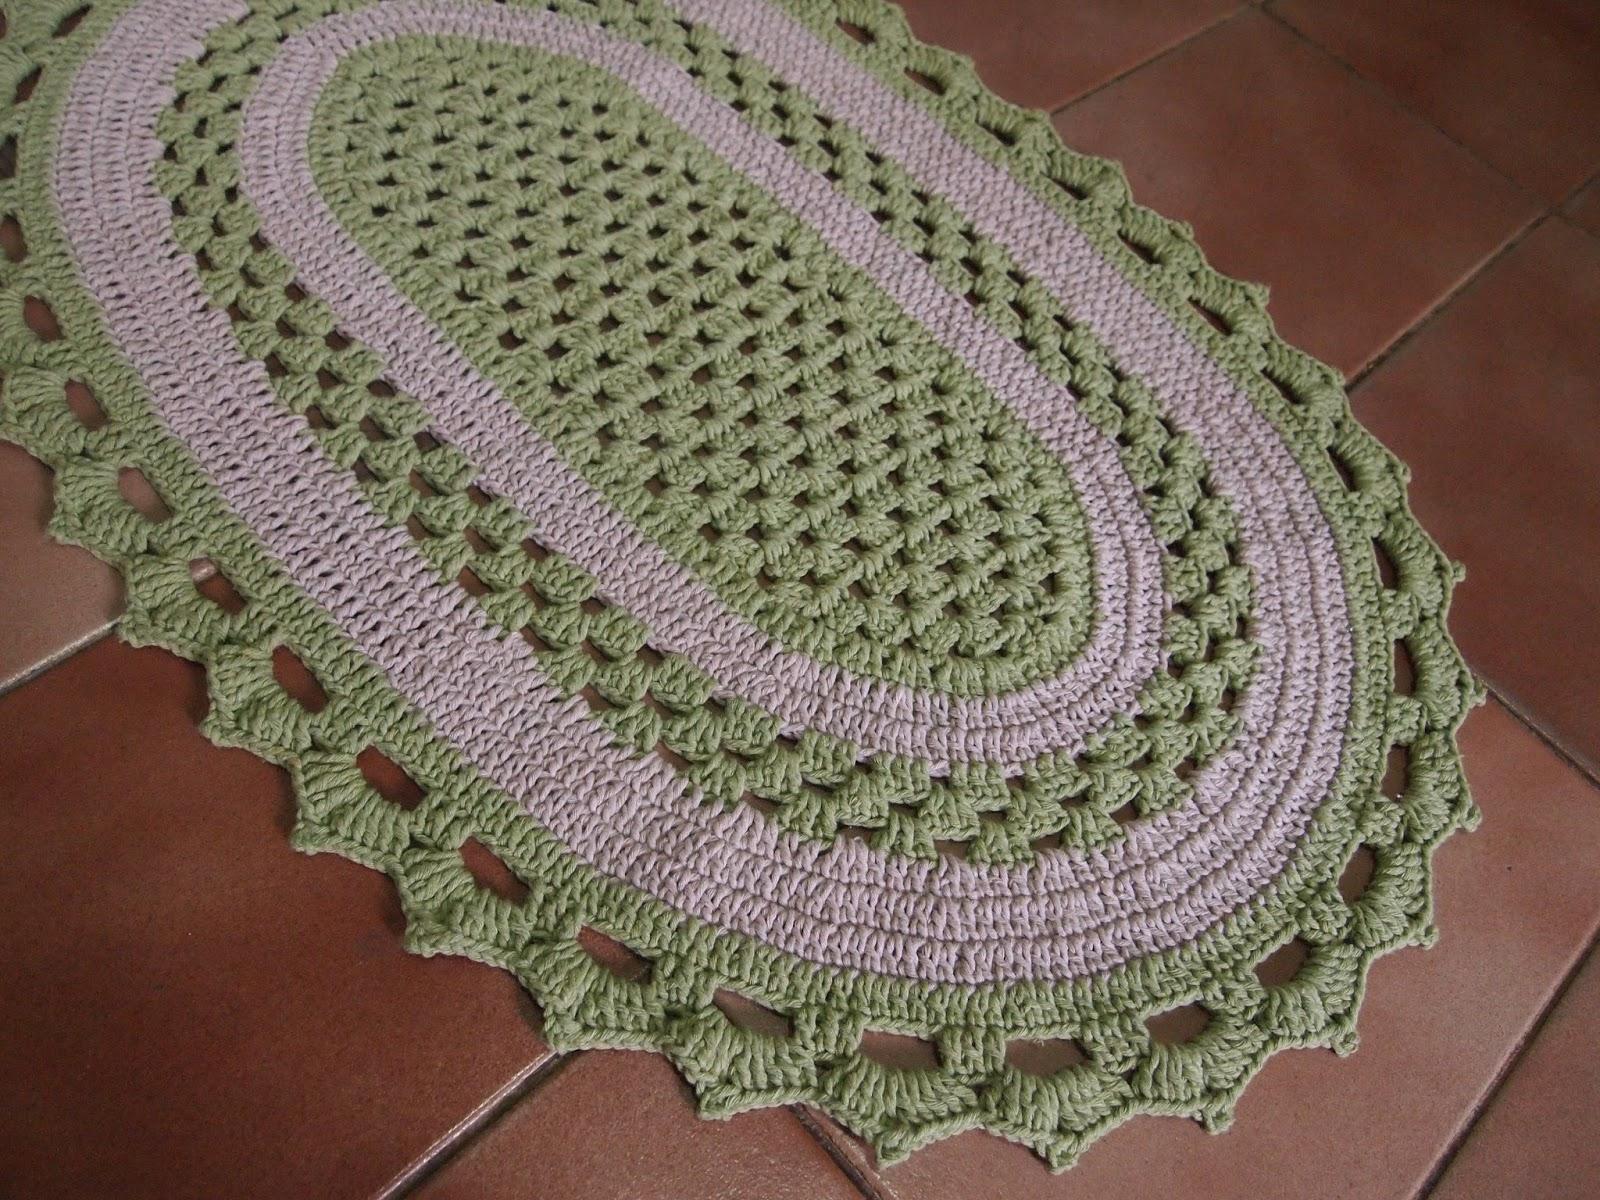 Tapetes De Croche Para Cozinha Oval Oppenau Info -> Tapete De Croche Oval Simples Passo A Passo